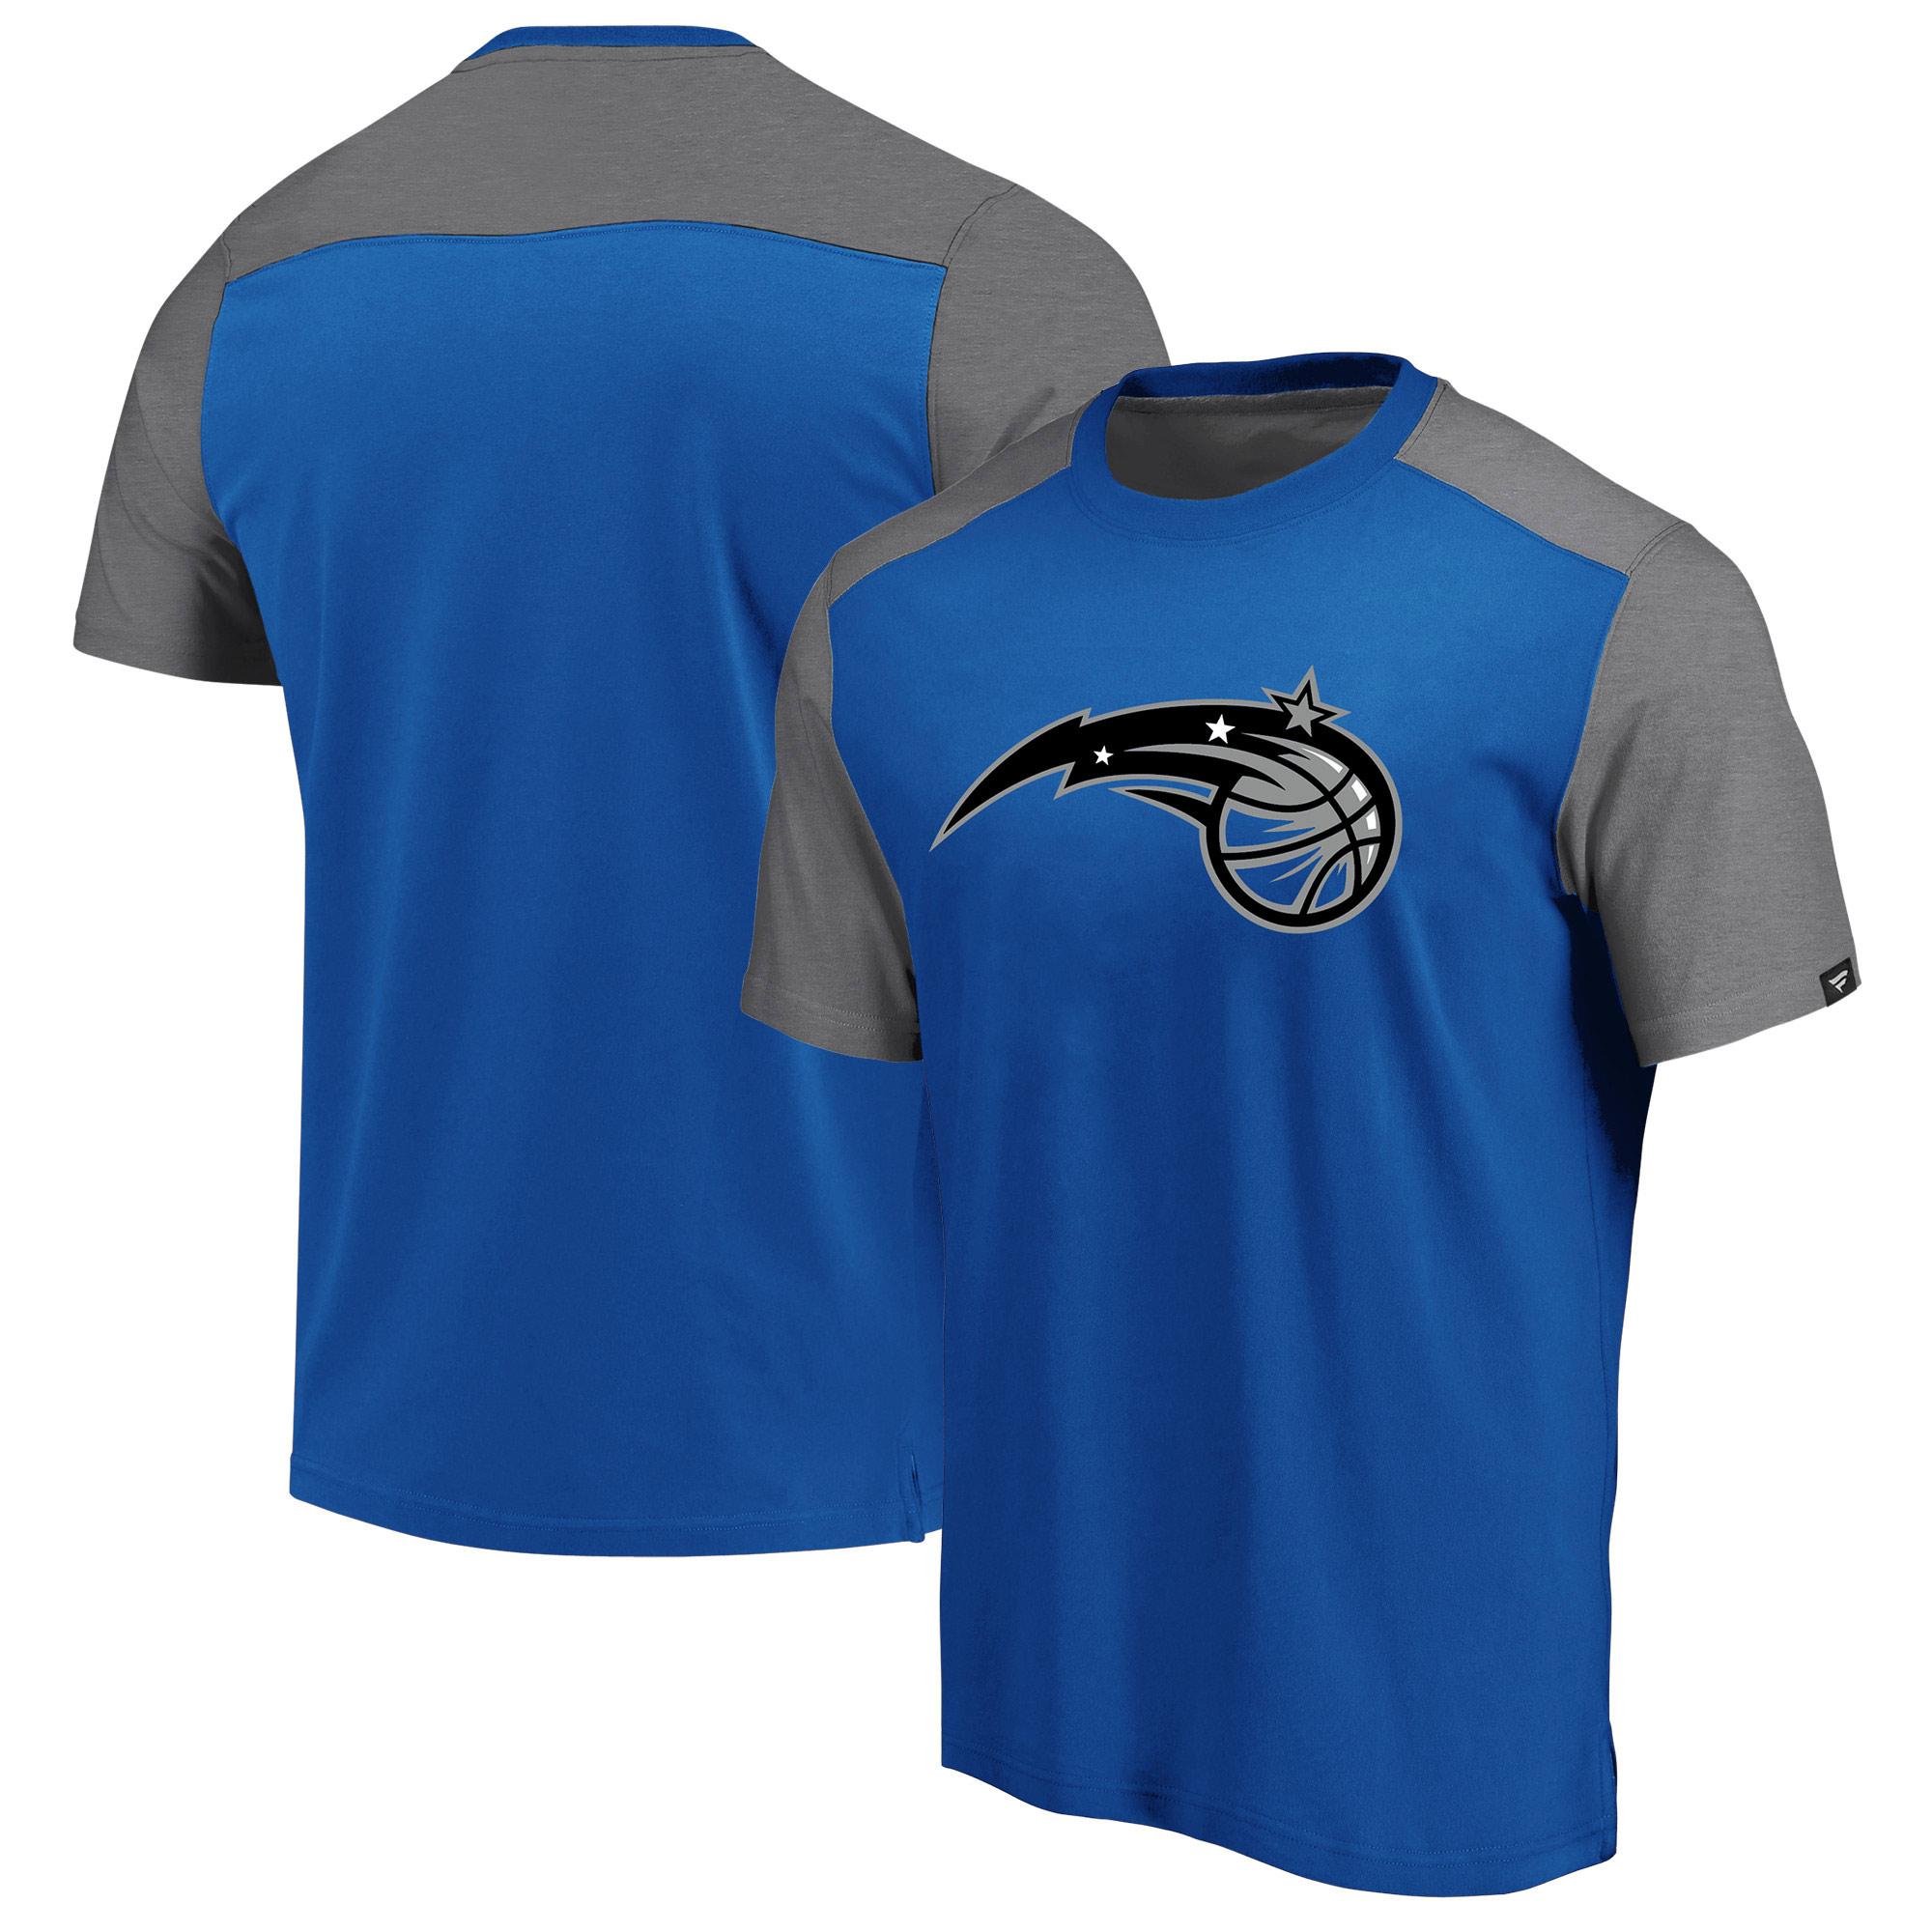 Orlando Magic Fanatics Branded Iconic Blocked T-Shirt - Royal/Heathered Gray